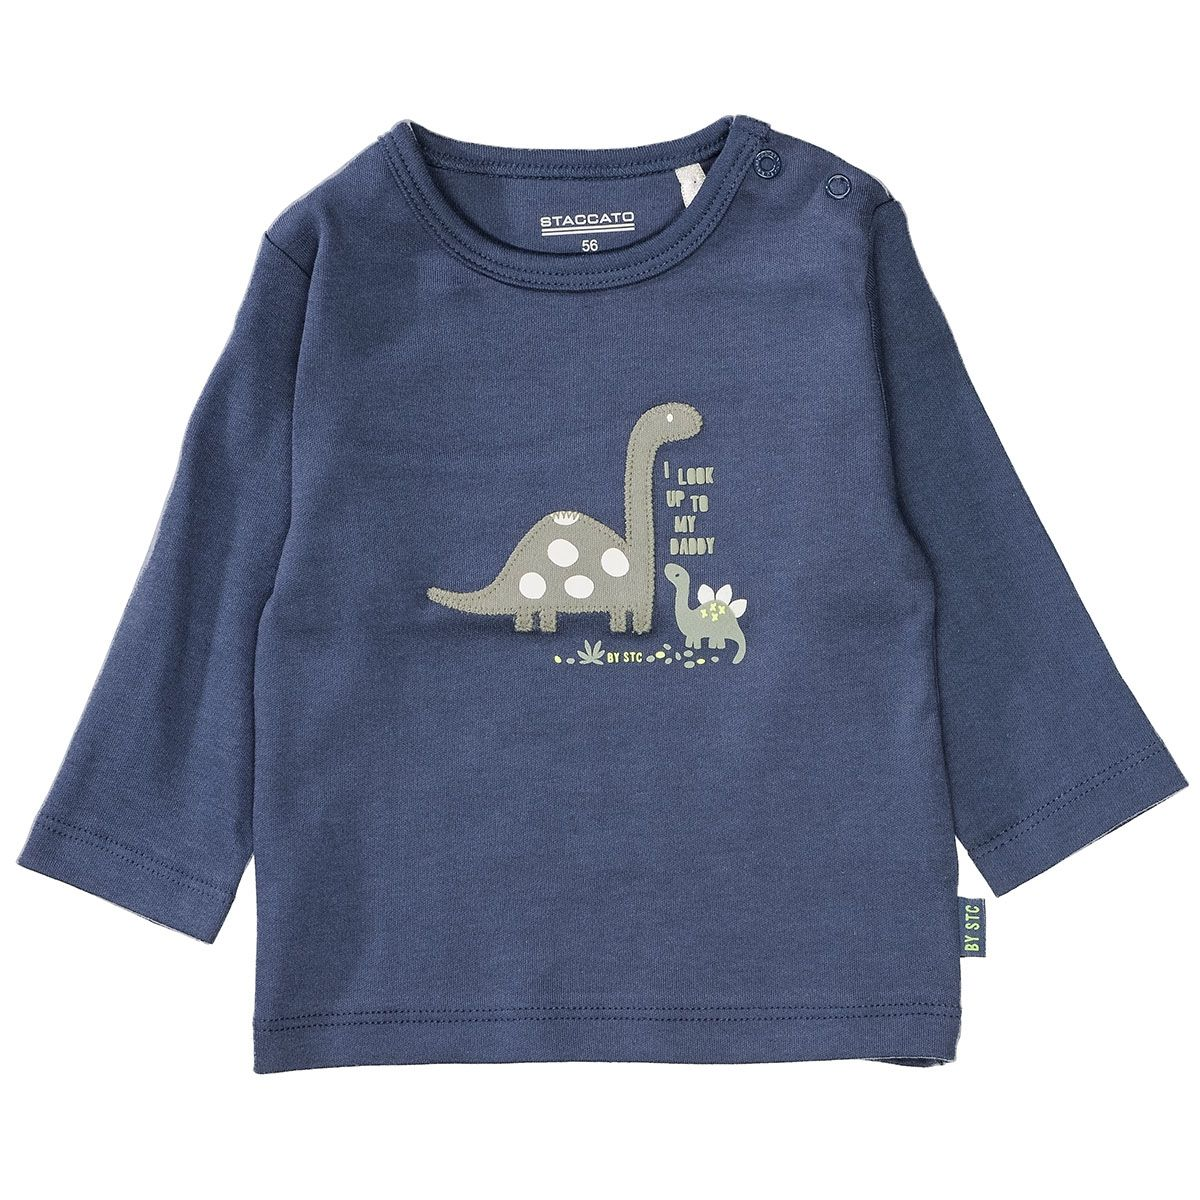 ORGANIC COTTON Shirt mit Applikation - Washed Blue